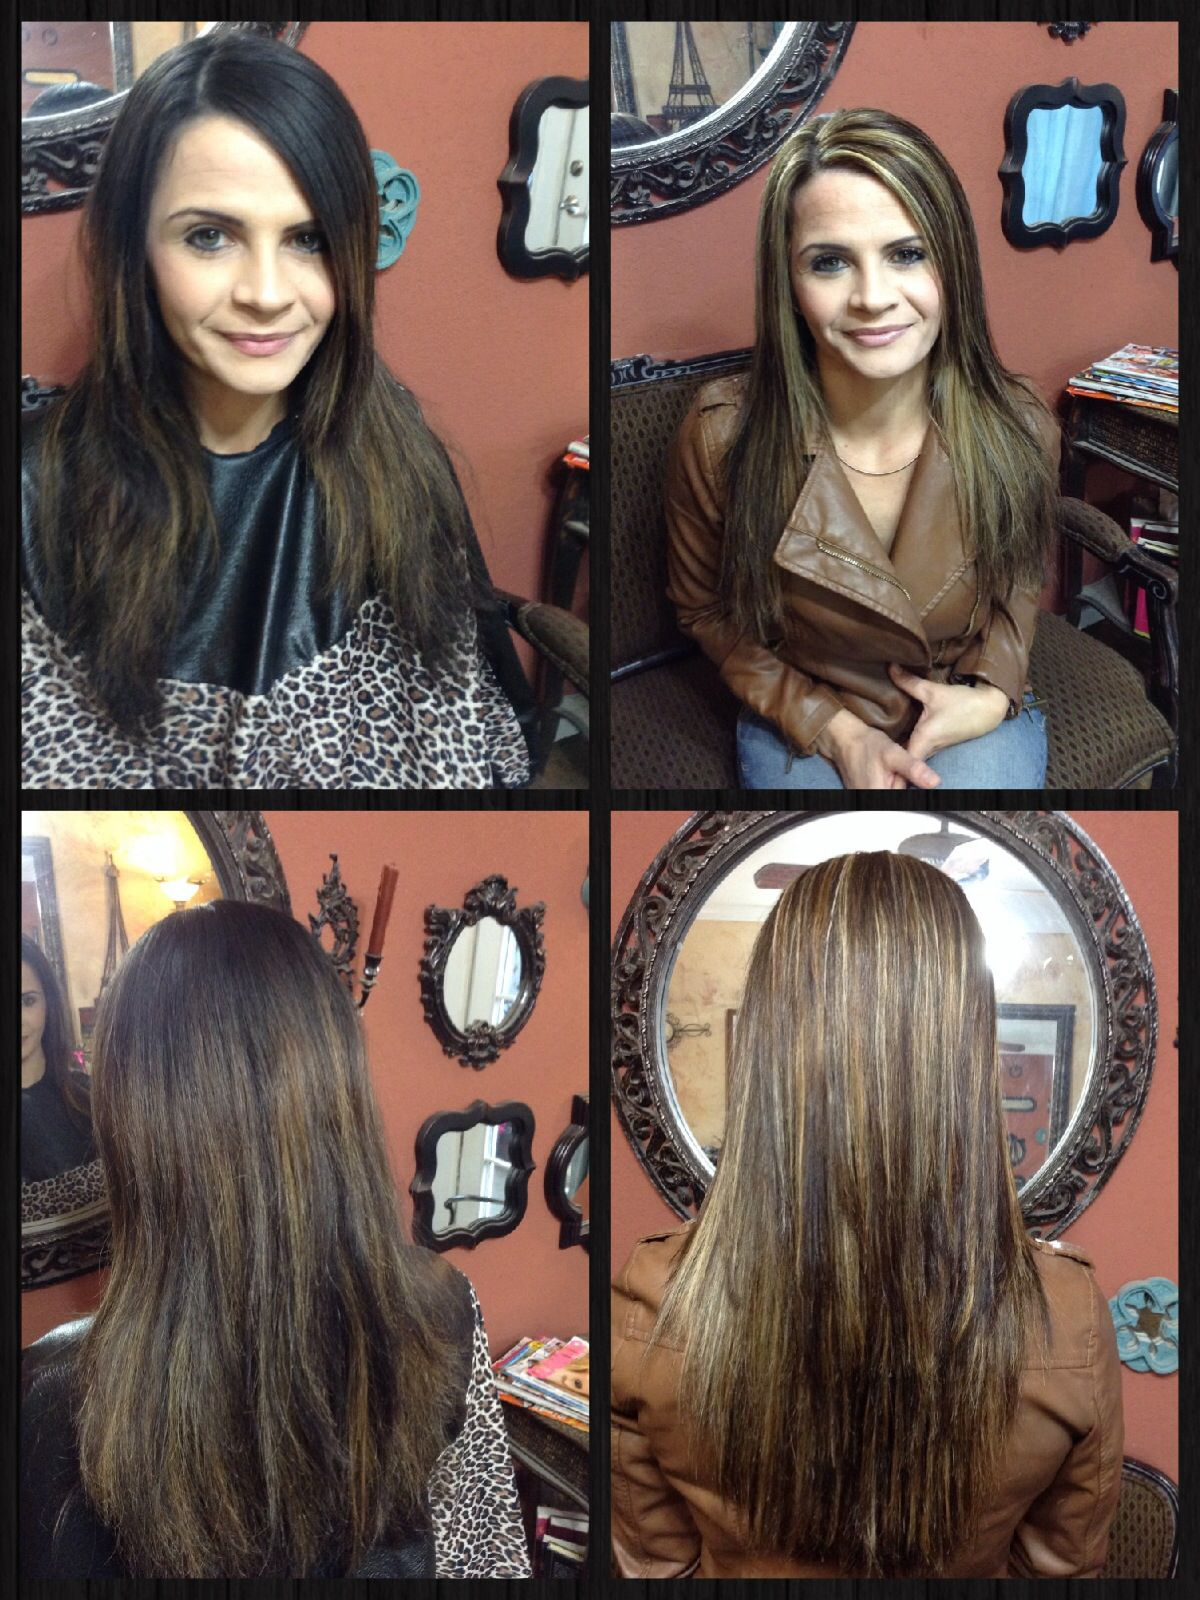 Joico hair color tags color jocio joico - On A Natural Level 4 6a Hla Bleach Joico Vero Color